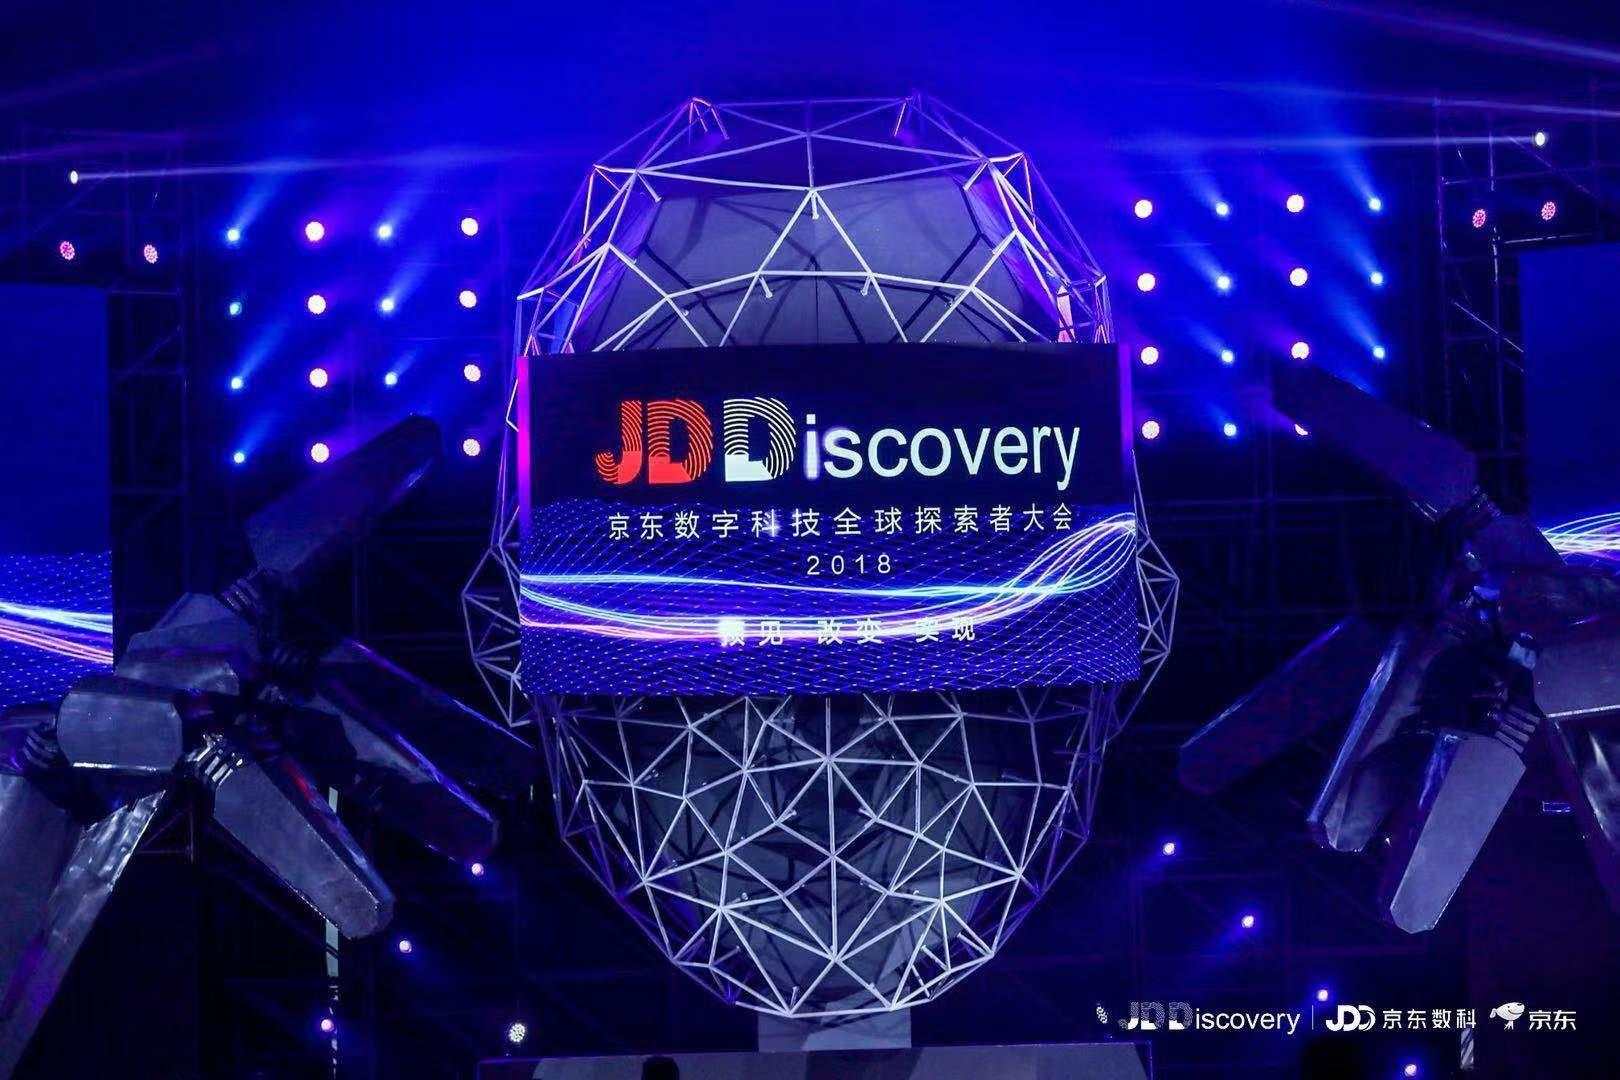 JDD-2018京东数字科技全球探索者大会开幕